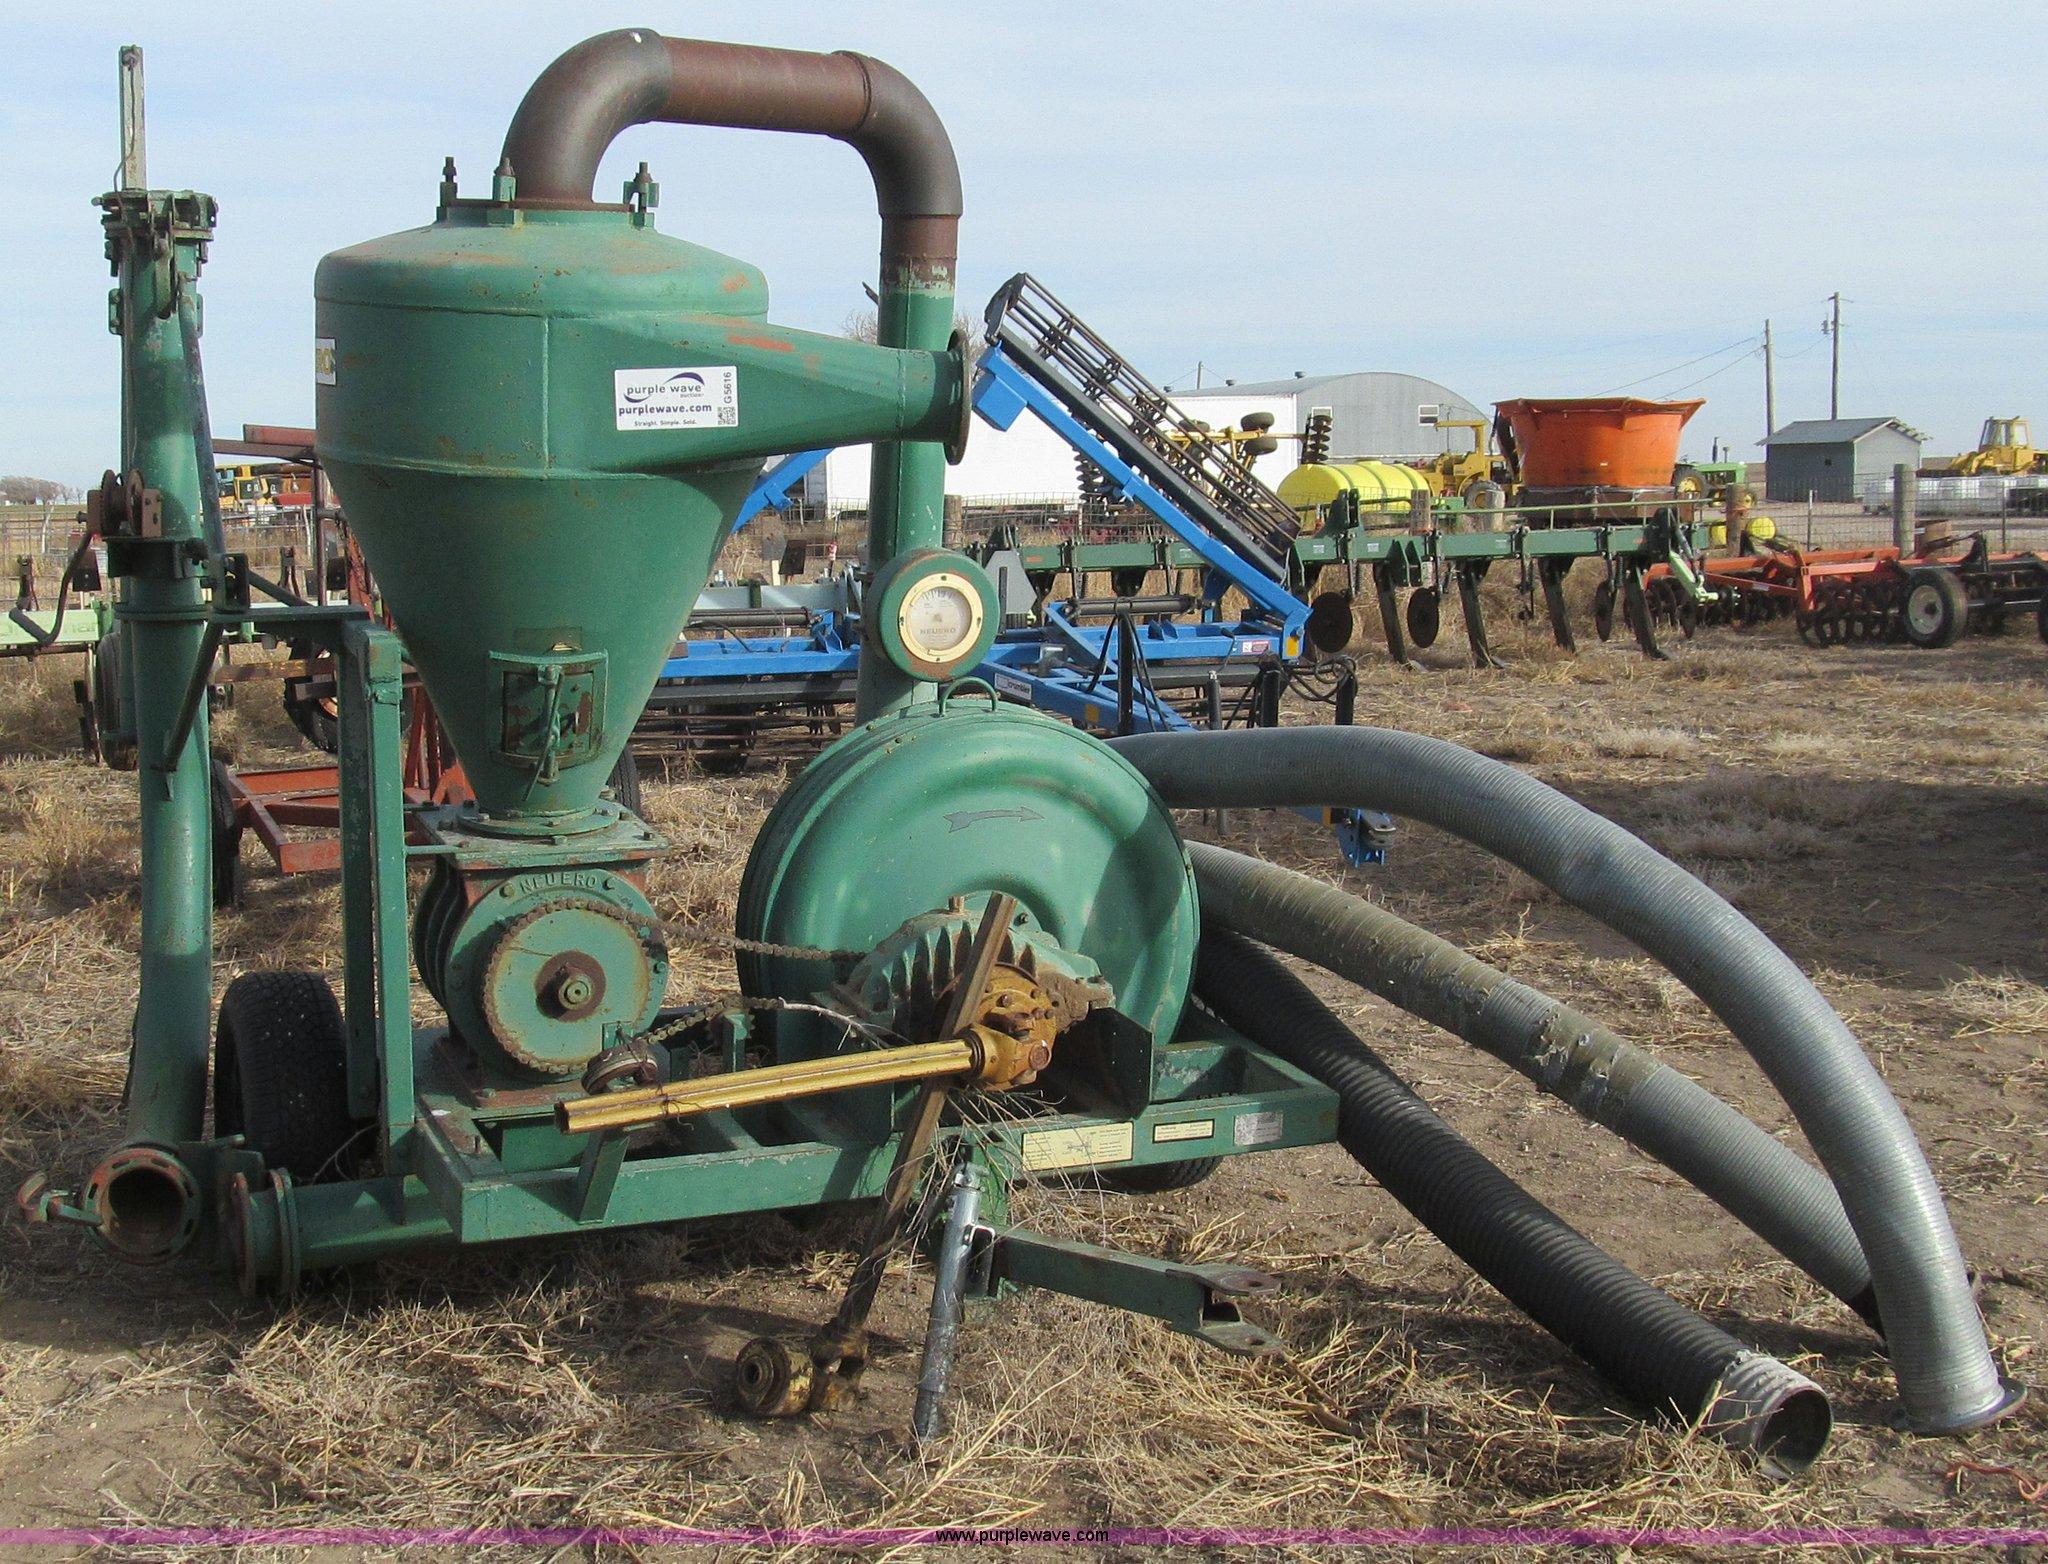 PTO driven Neuero 1096 grain vac with hoses | Item G5616 | S